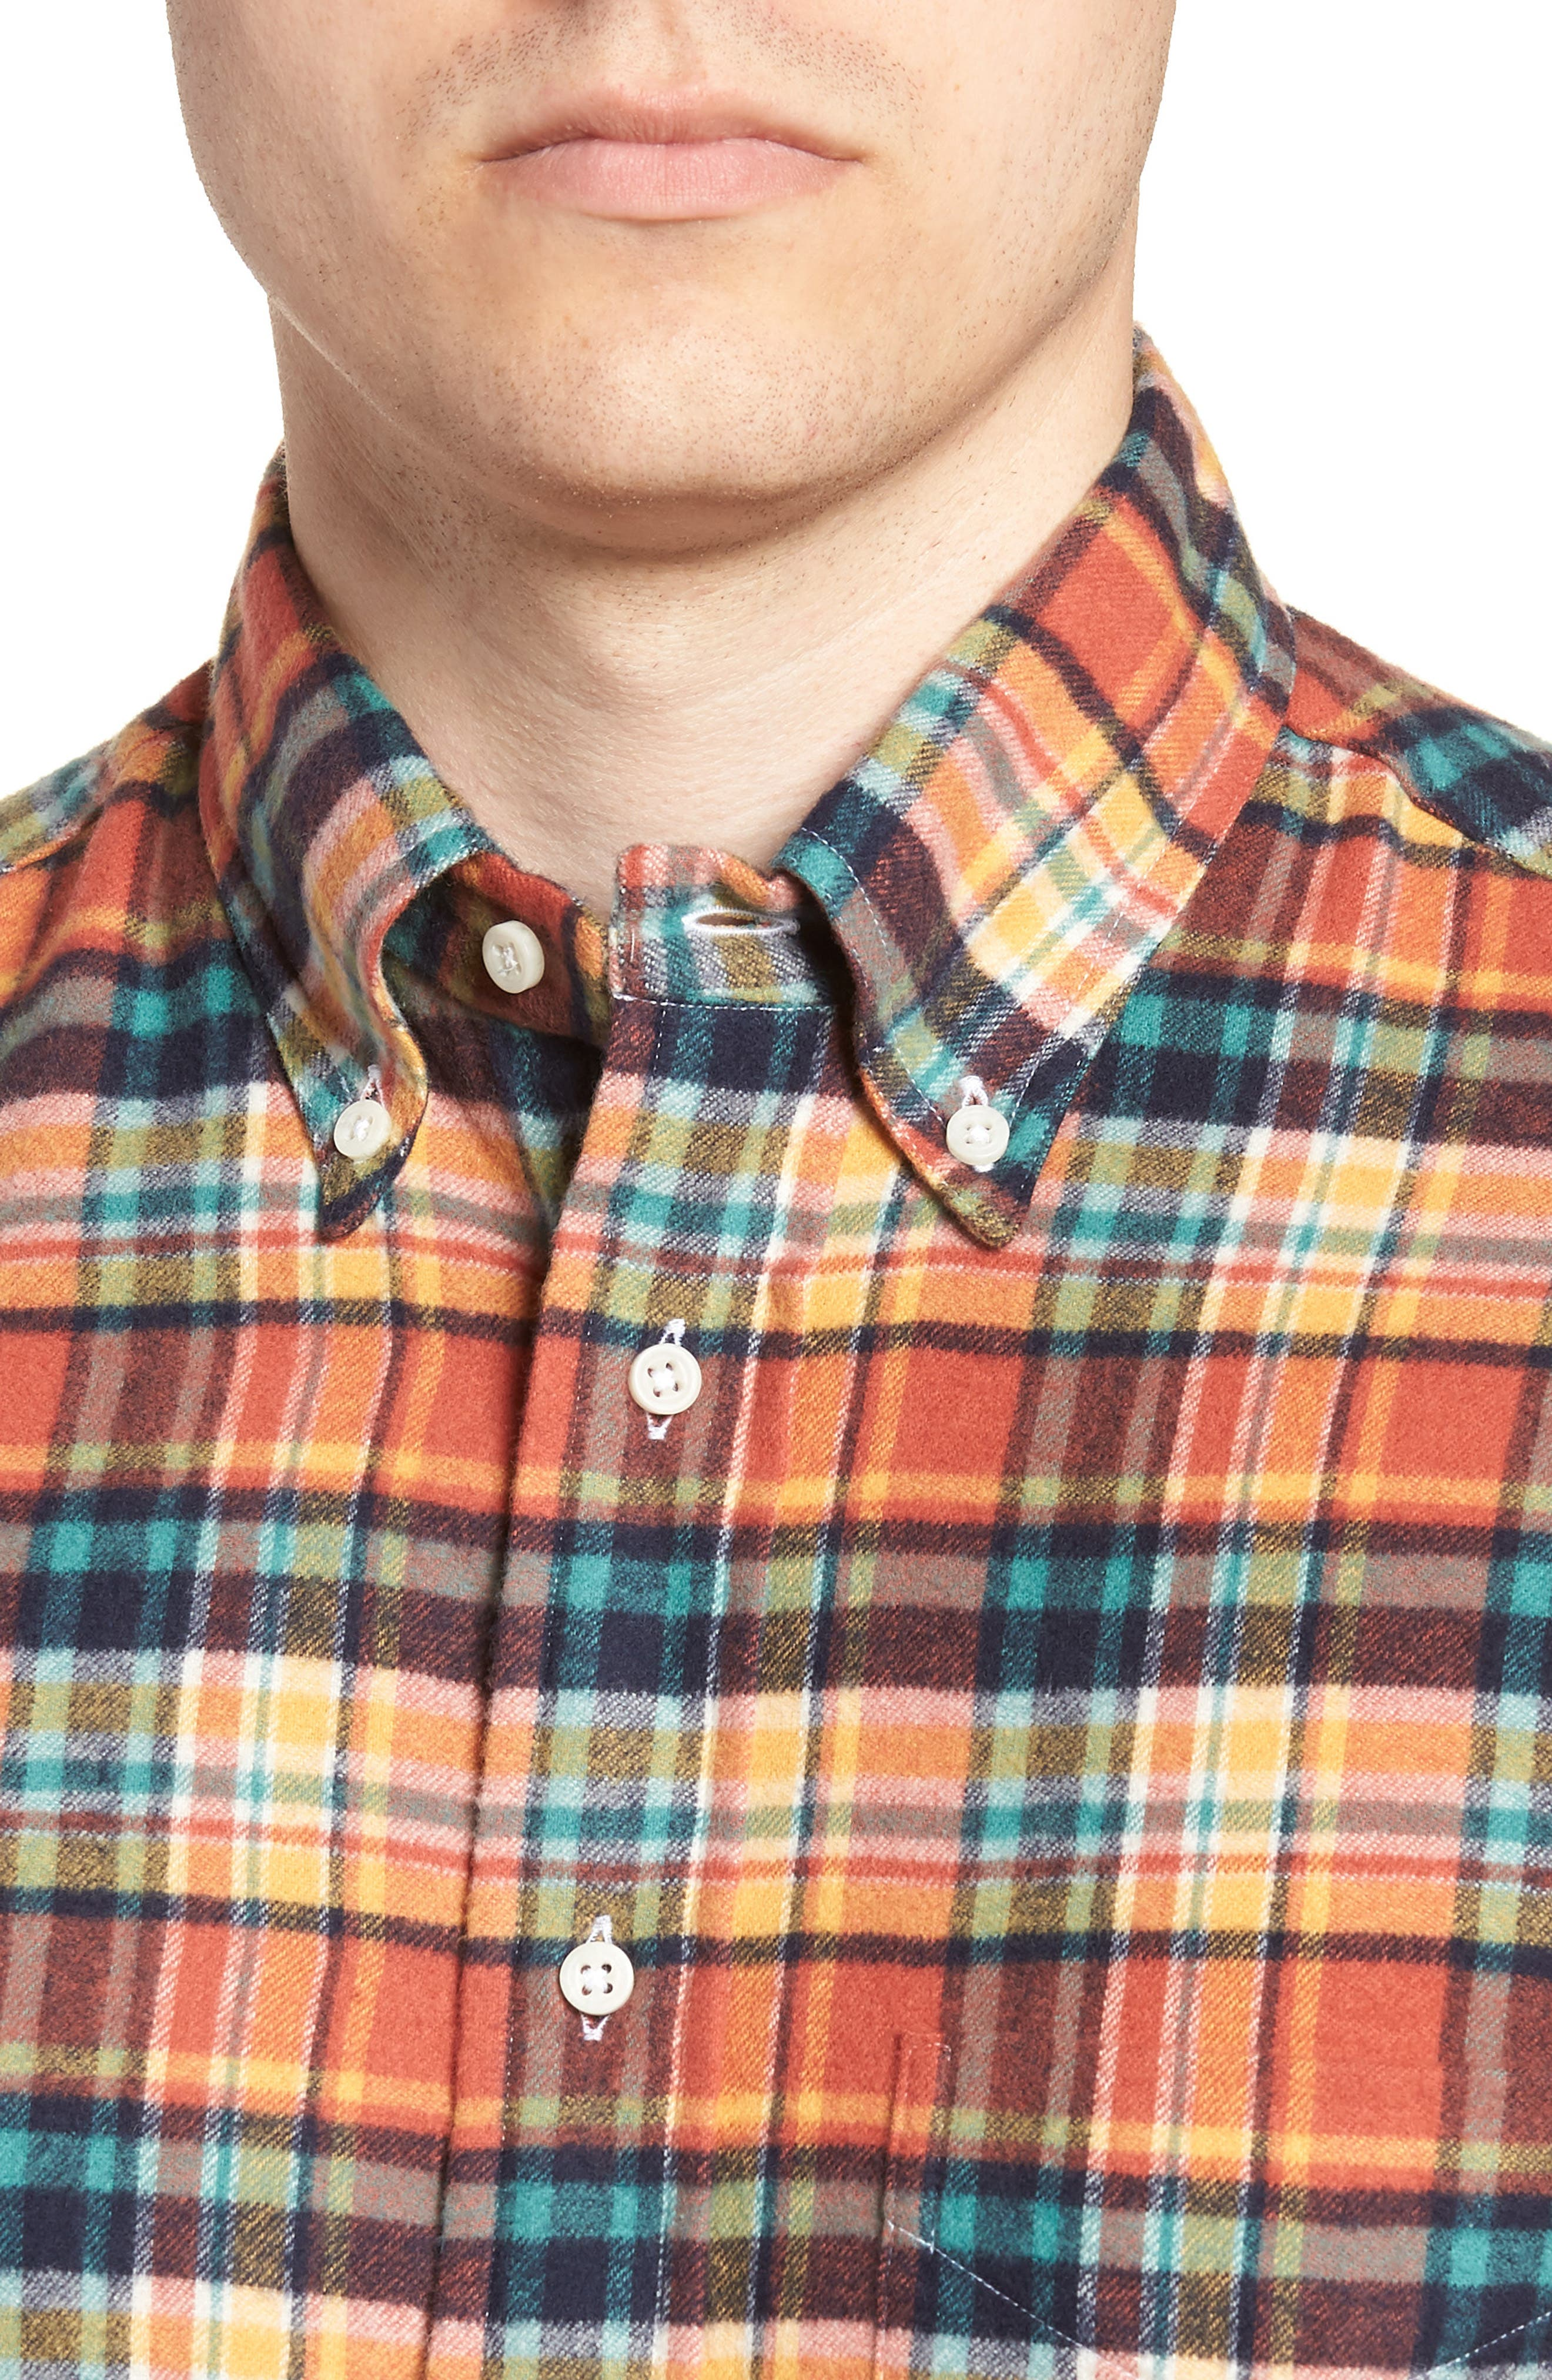 Regular Fit Flannel Shirt,                             Alternate thumbnail 2, color,                             800